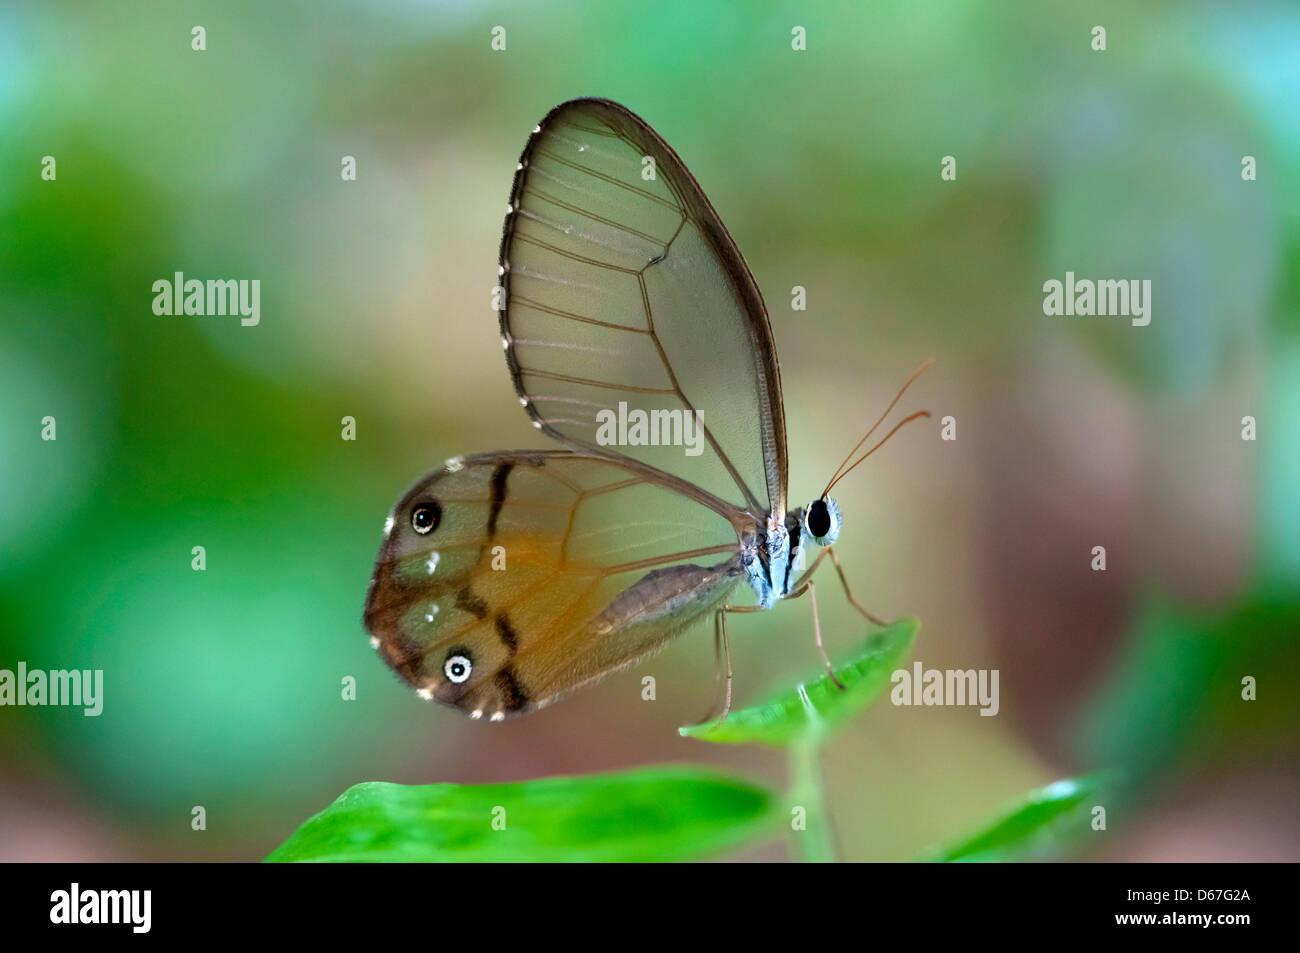 Clearwing butterfly Haetera piera, Tambopata Nature Reserve, Madre de Dios region, Peru Stock Photo